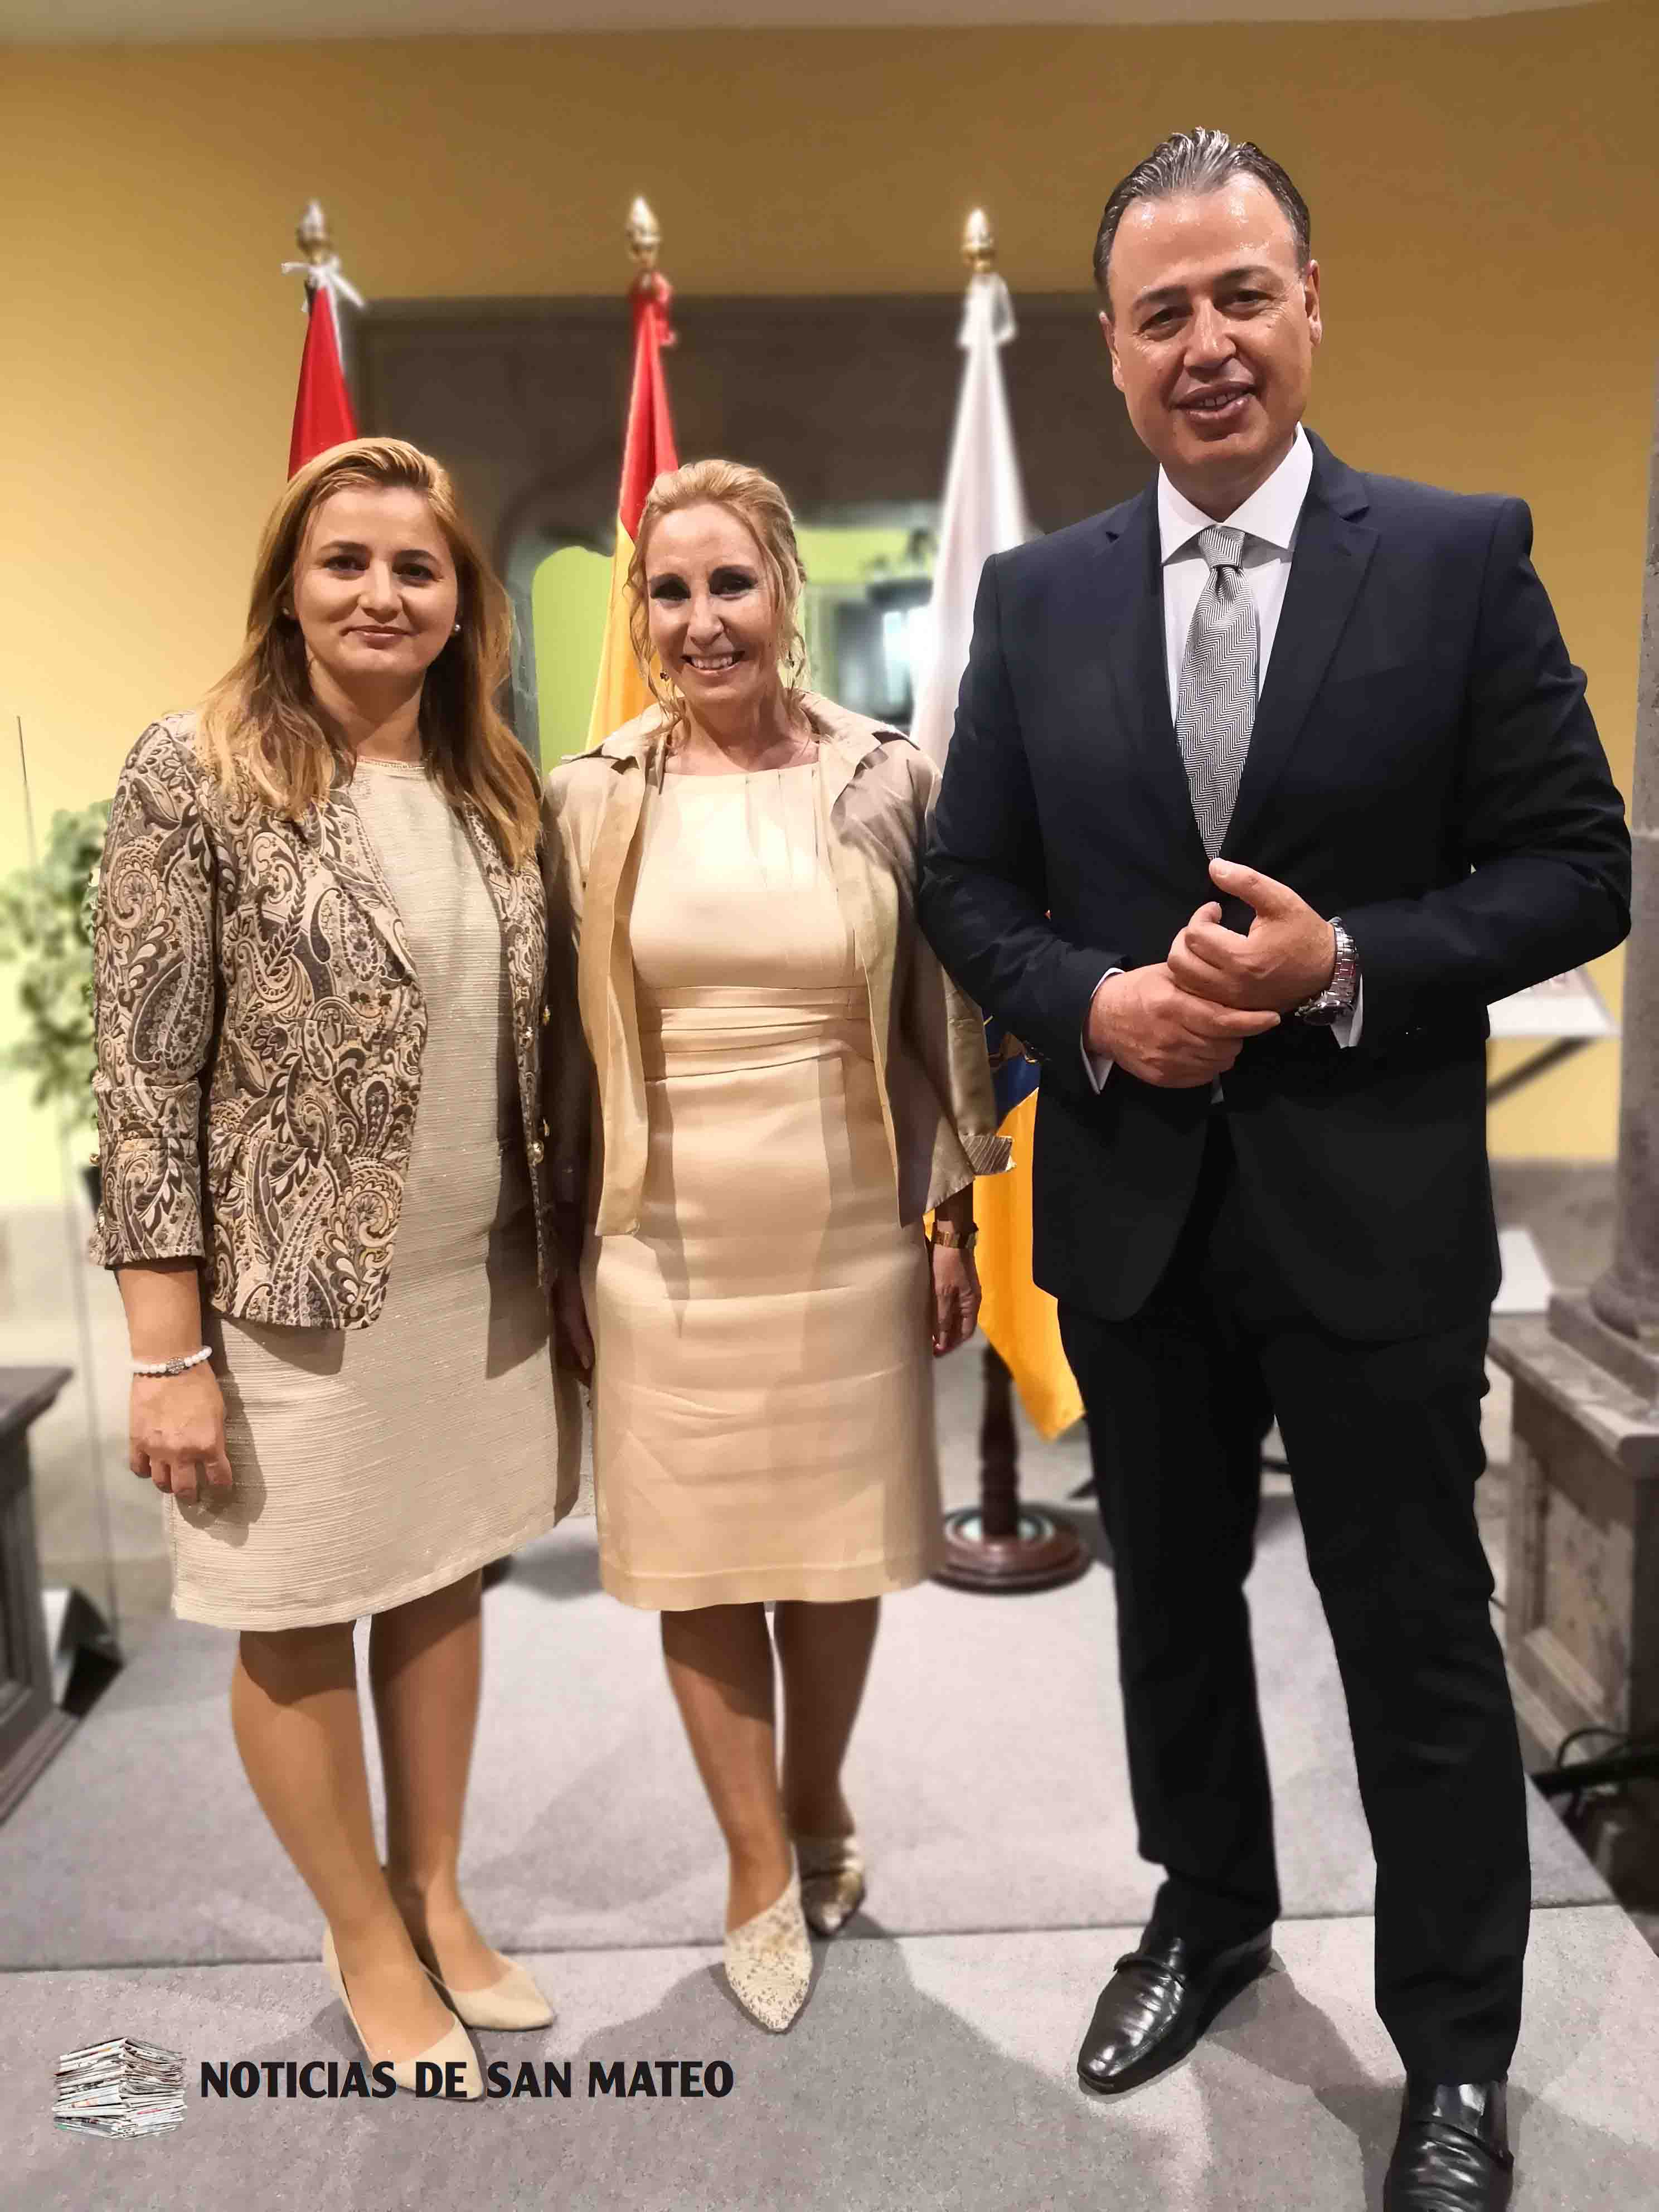 Consul de Paraguay Foto Laura Miranda Noticias de San Mateo